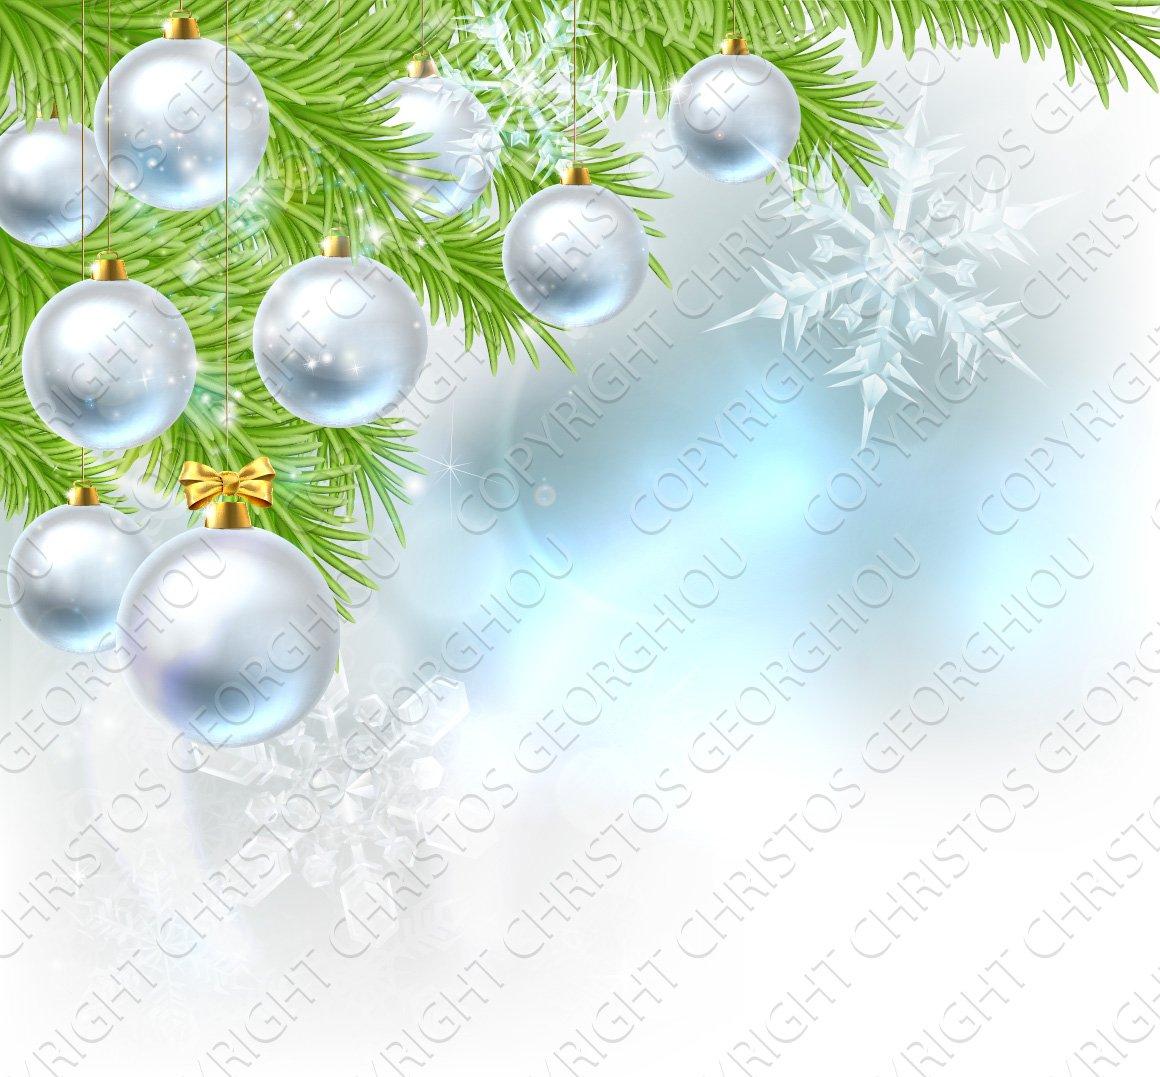 christmas tree baubles background illustrations. Black Bedroom Furniture Sets. Home Design Ideas